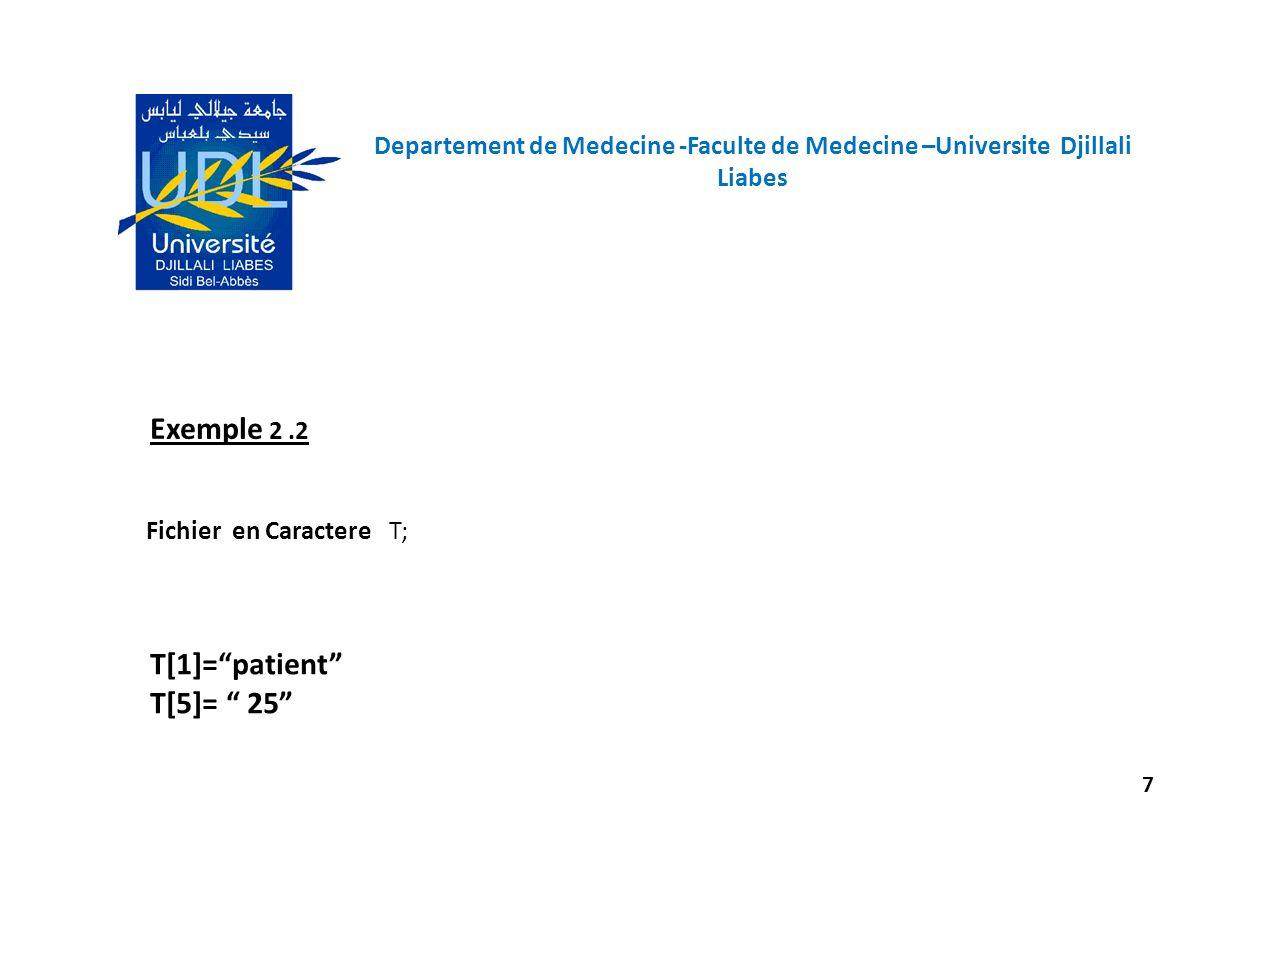 Departement de Medecine -Faculte de Medecine –Universite Djillali Liabes 7 T[1]=patient T[5]= 25 Exemple 2.2 Fichier en Caractere T;